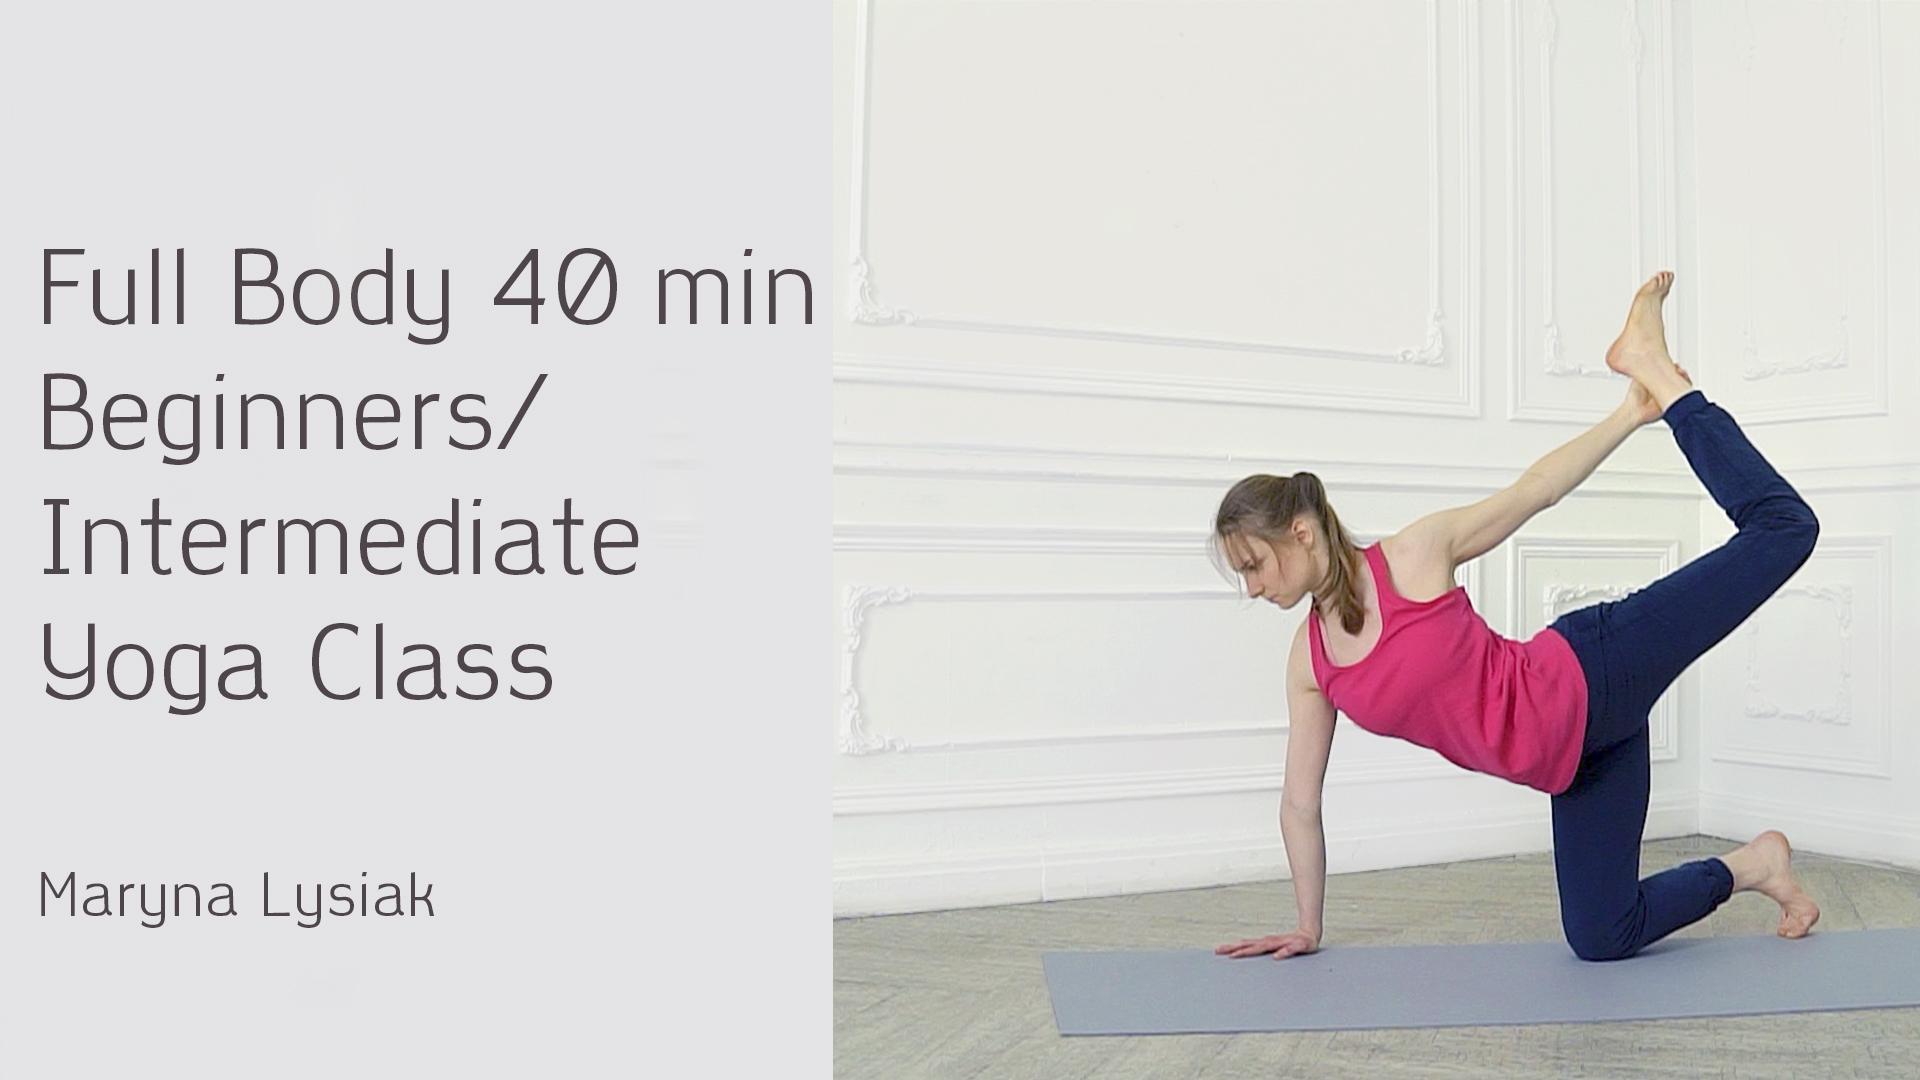 Full Body 40 min Beginners/Intermediate Yoga Class